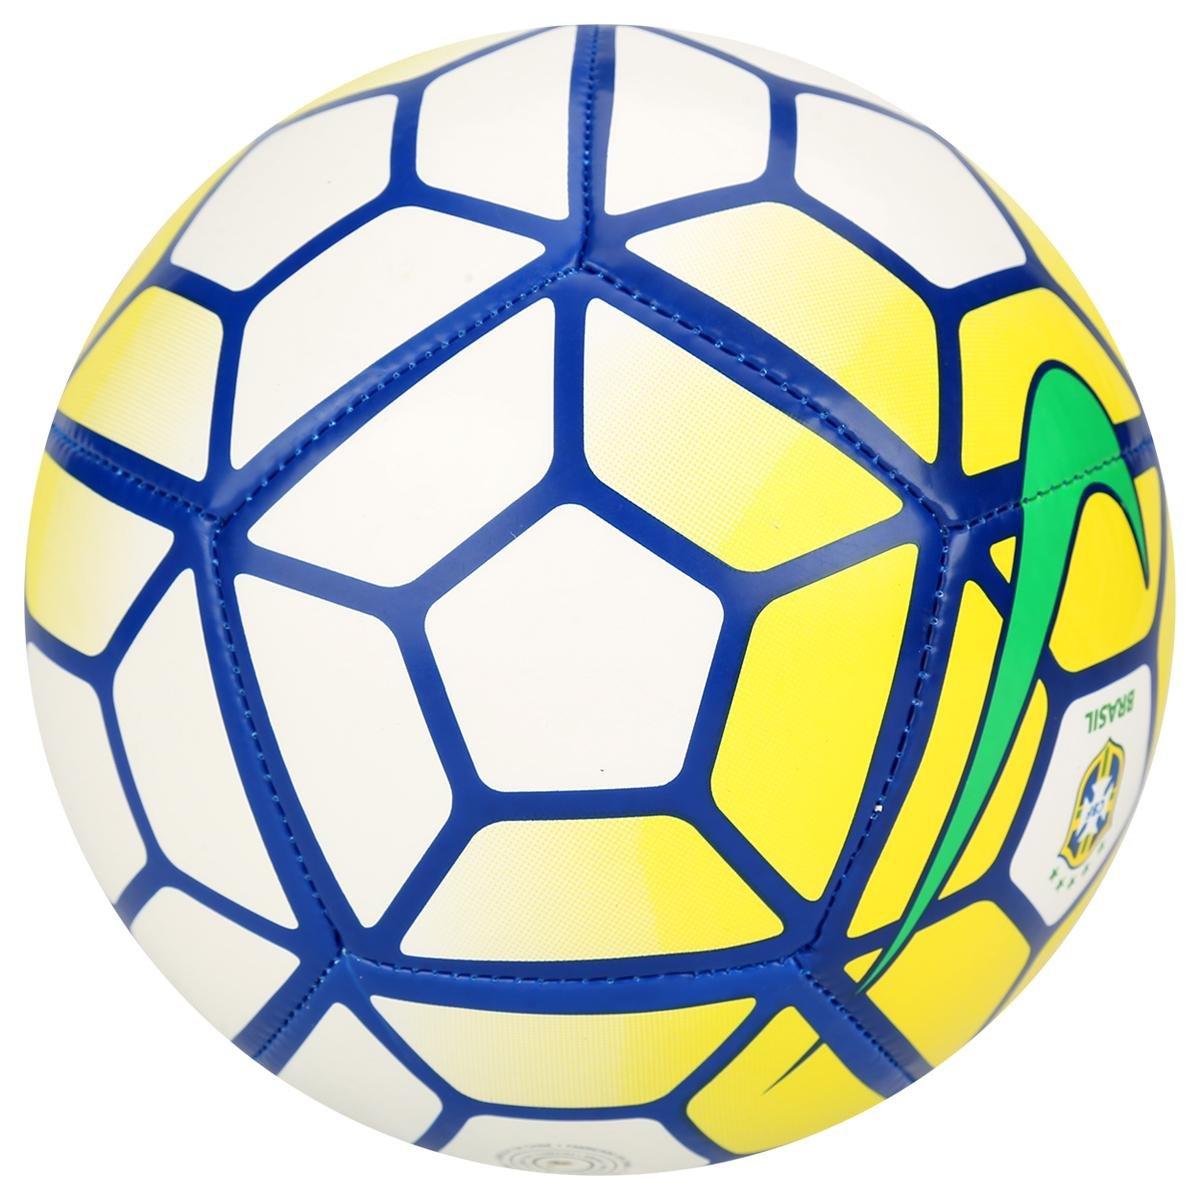 MiniBola Futebol Nike Skills CBF - Compre Agora  c63980f02a463